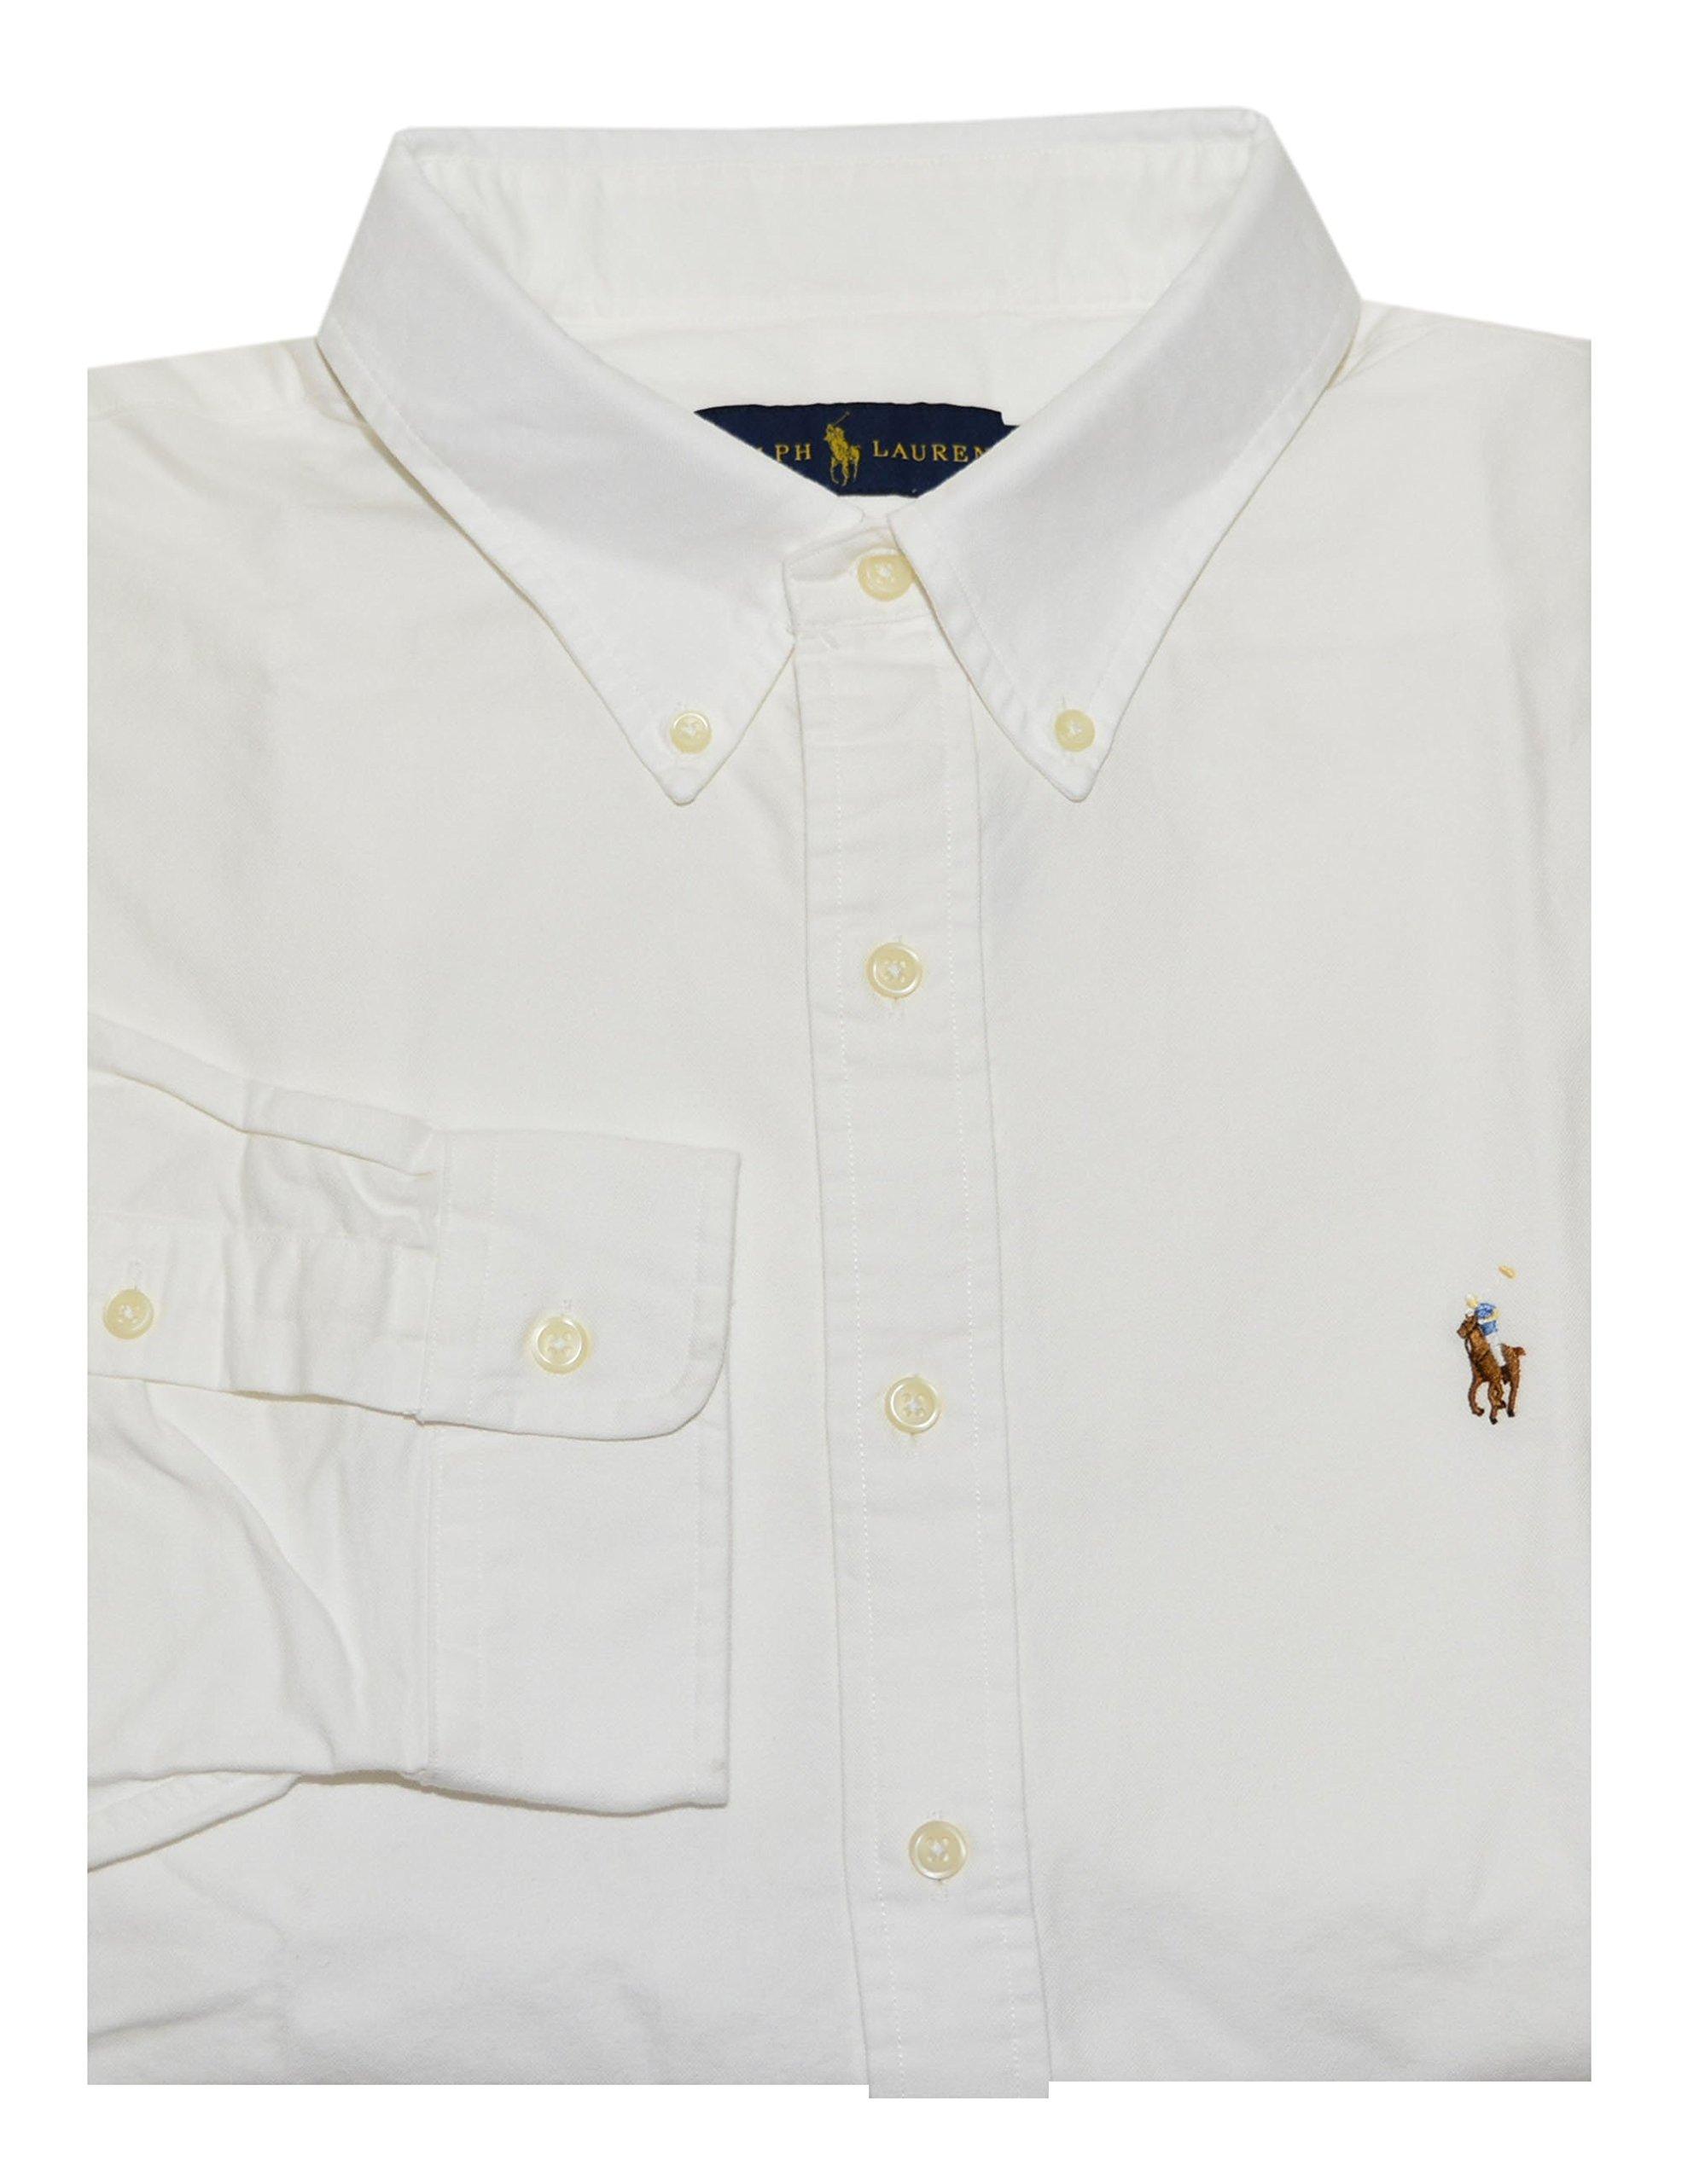 Polo Ralph Lauren Men's Long Sleeve Button Down Oxford Shirt (Large, White)